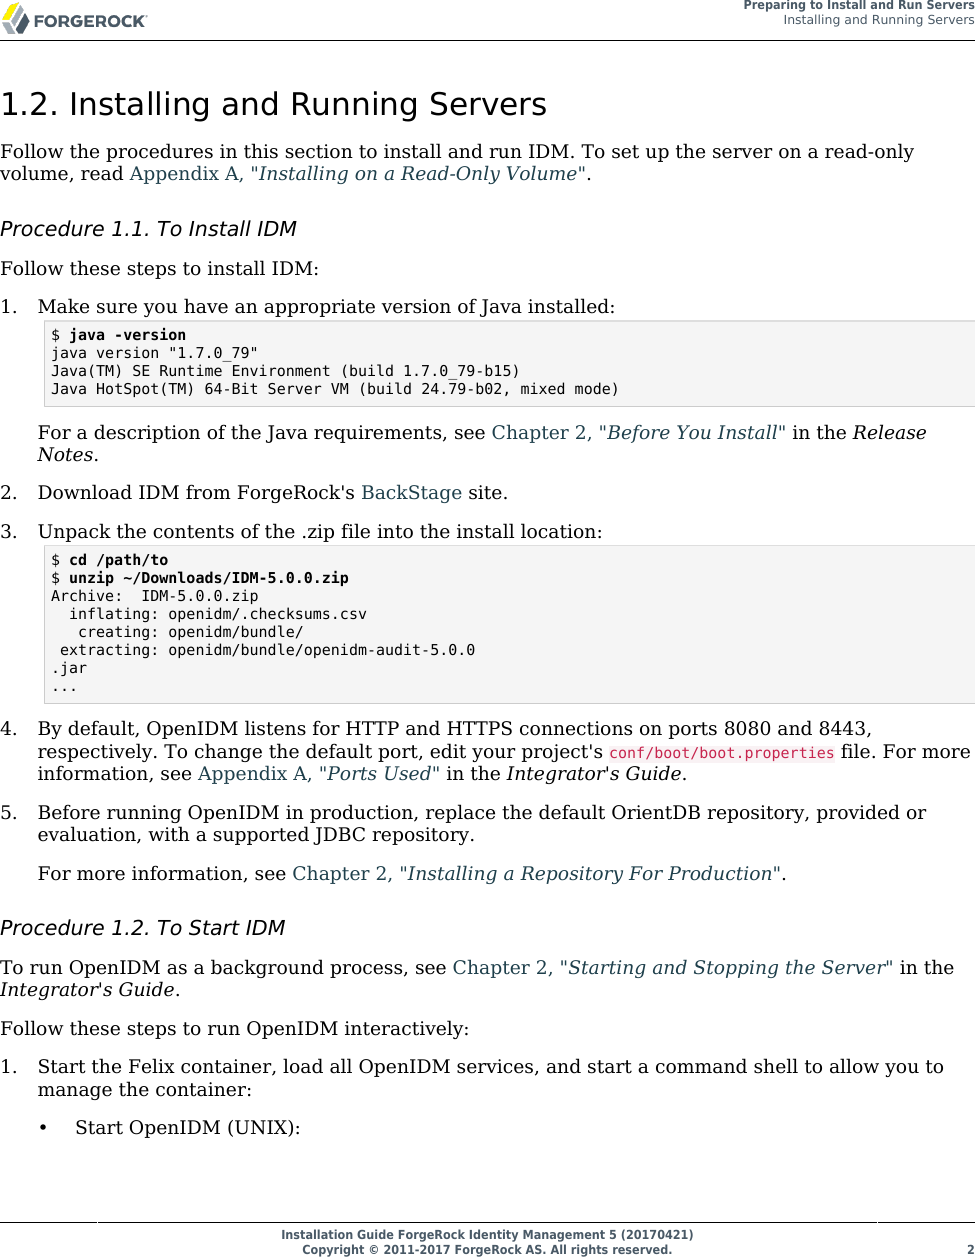 Installation Guide ForgeRock Identity Management 5 IDM Install